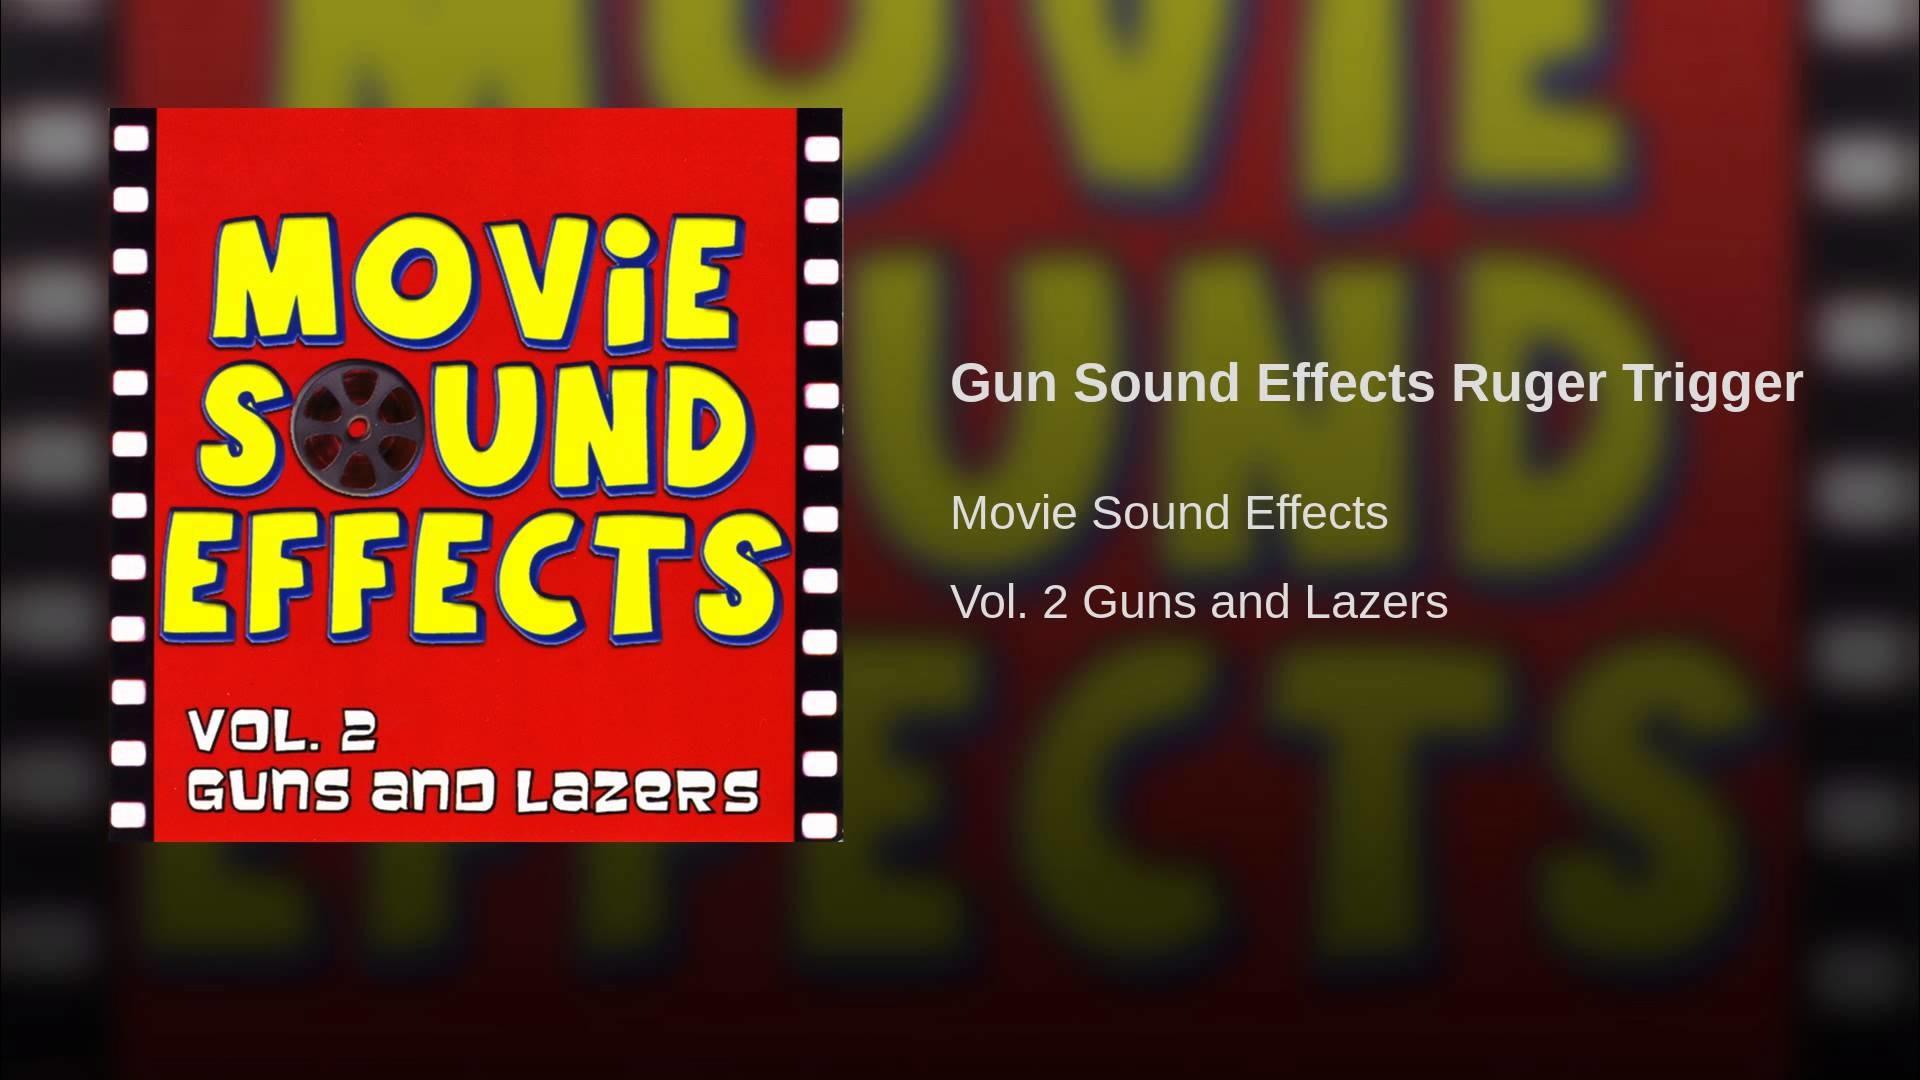 Gun Sound Effects Ruger Trigger